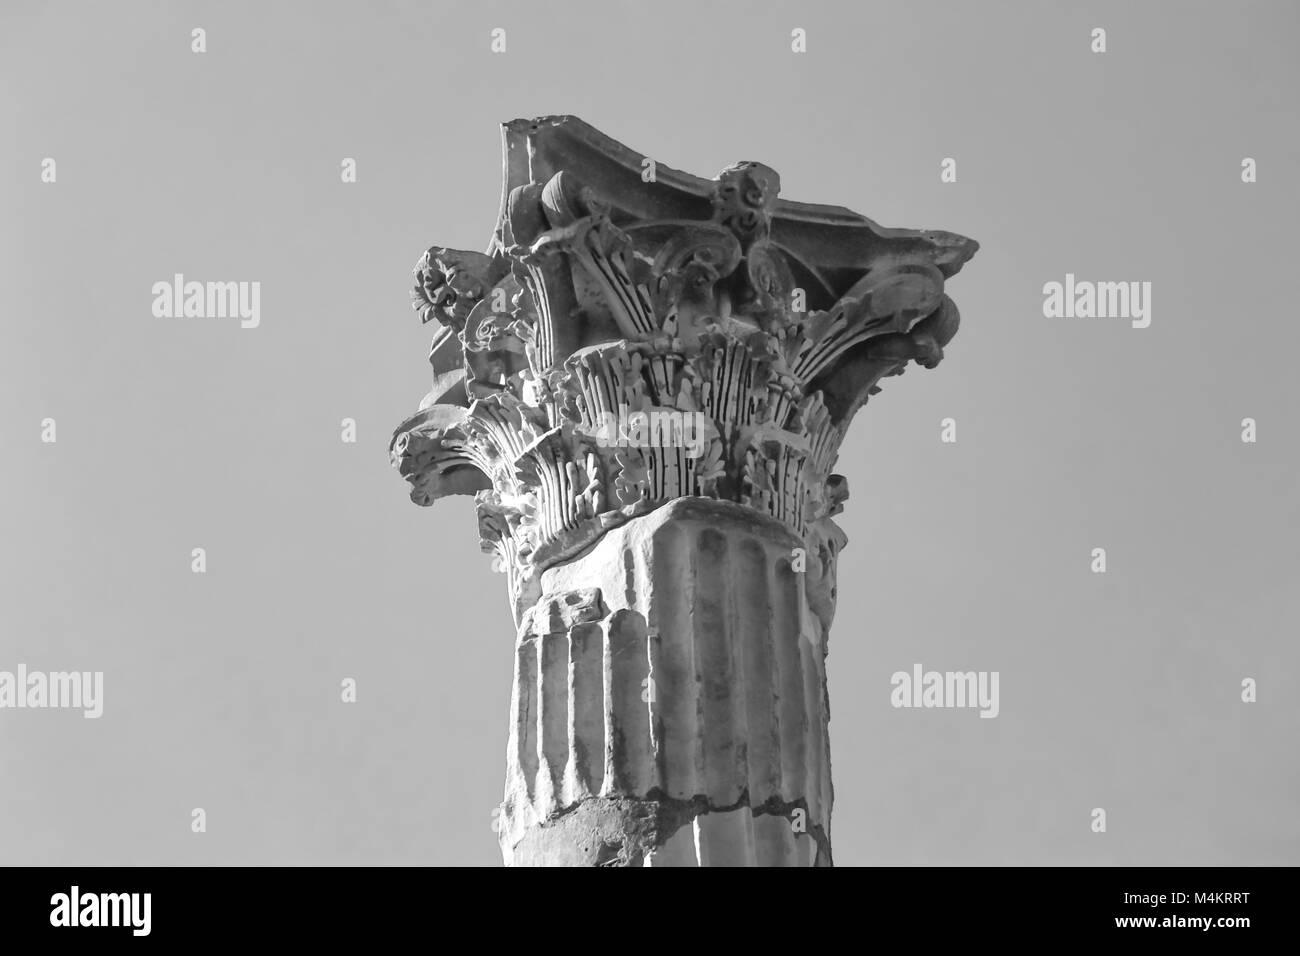 OSTIA ANTICA RUINS: ROMAN AGE COLUMN'S CAPITAL. - Stock Image